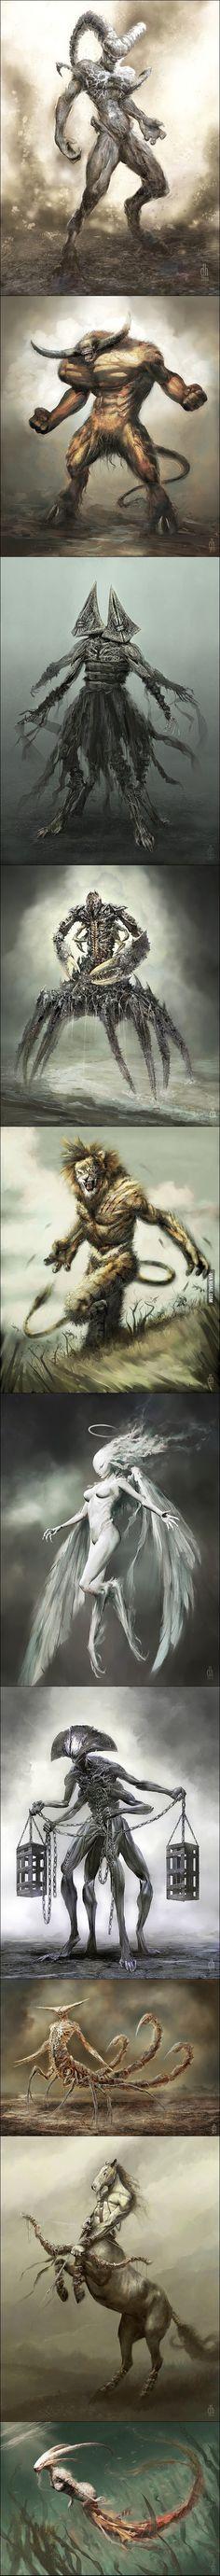 12 Zodiac Signs Reborn As Terrifying Monsters By Damon Hellandbrand 12 Zodiac, Zodiac Signs, Dark Fantasy, Fantasy Art, Angels And Demons, Creature Design, Mythical Creatures, Dark Art, Amazing Art